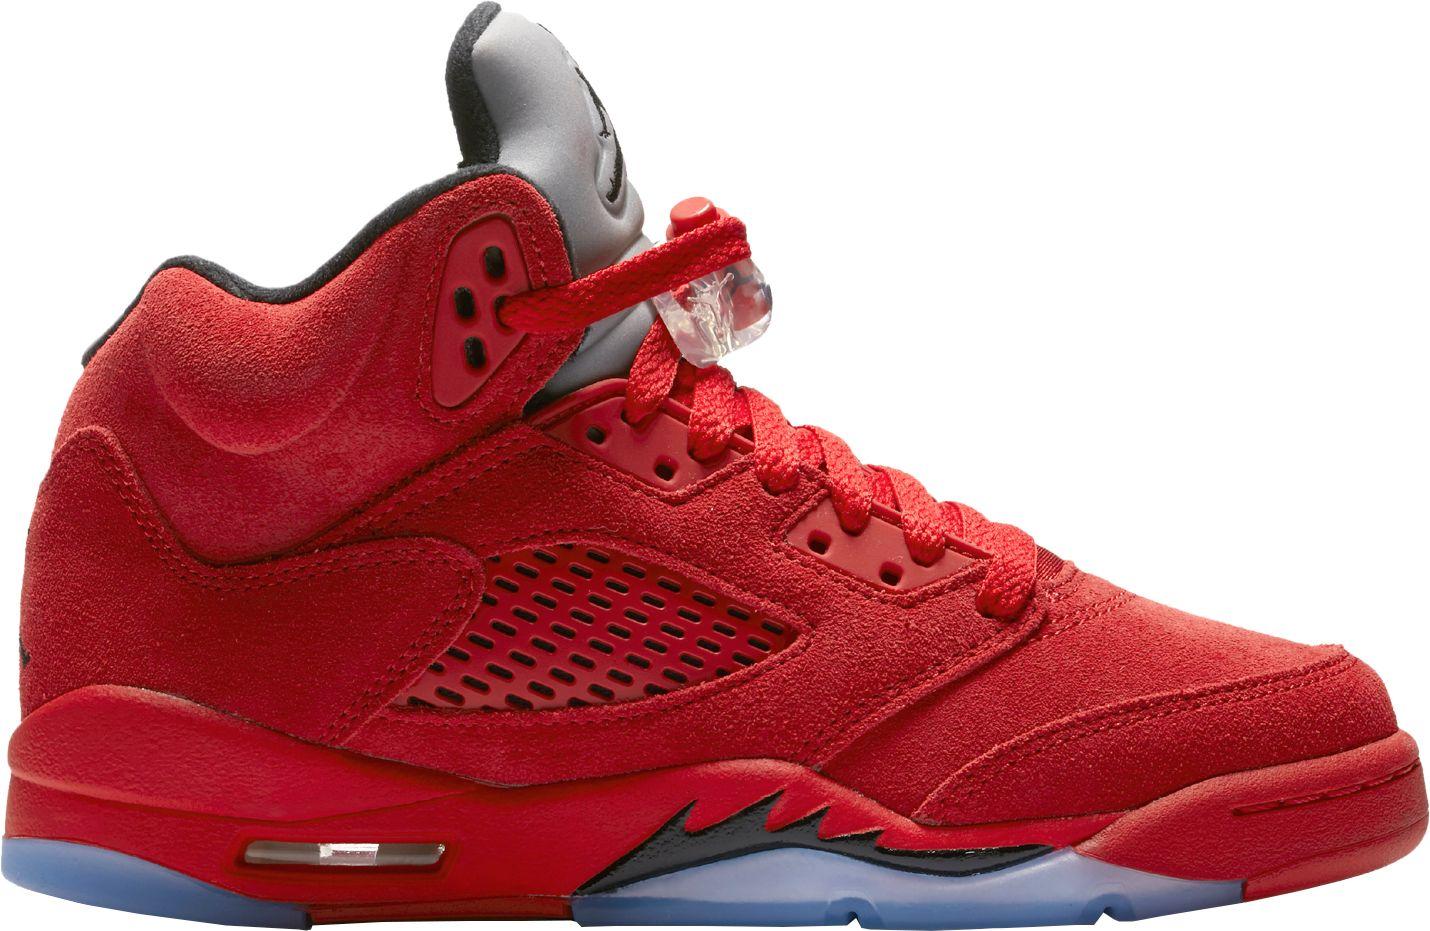 low priced bd880 06a9a Jordan Kids' Grade School Air Jordan 5 Retro Basketball ...